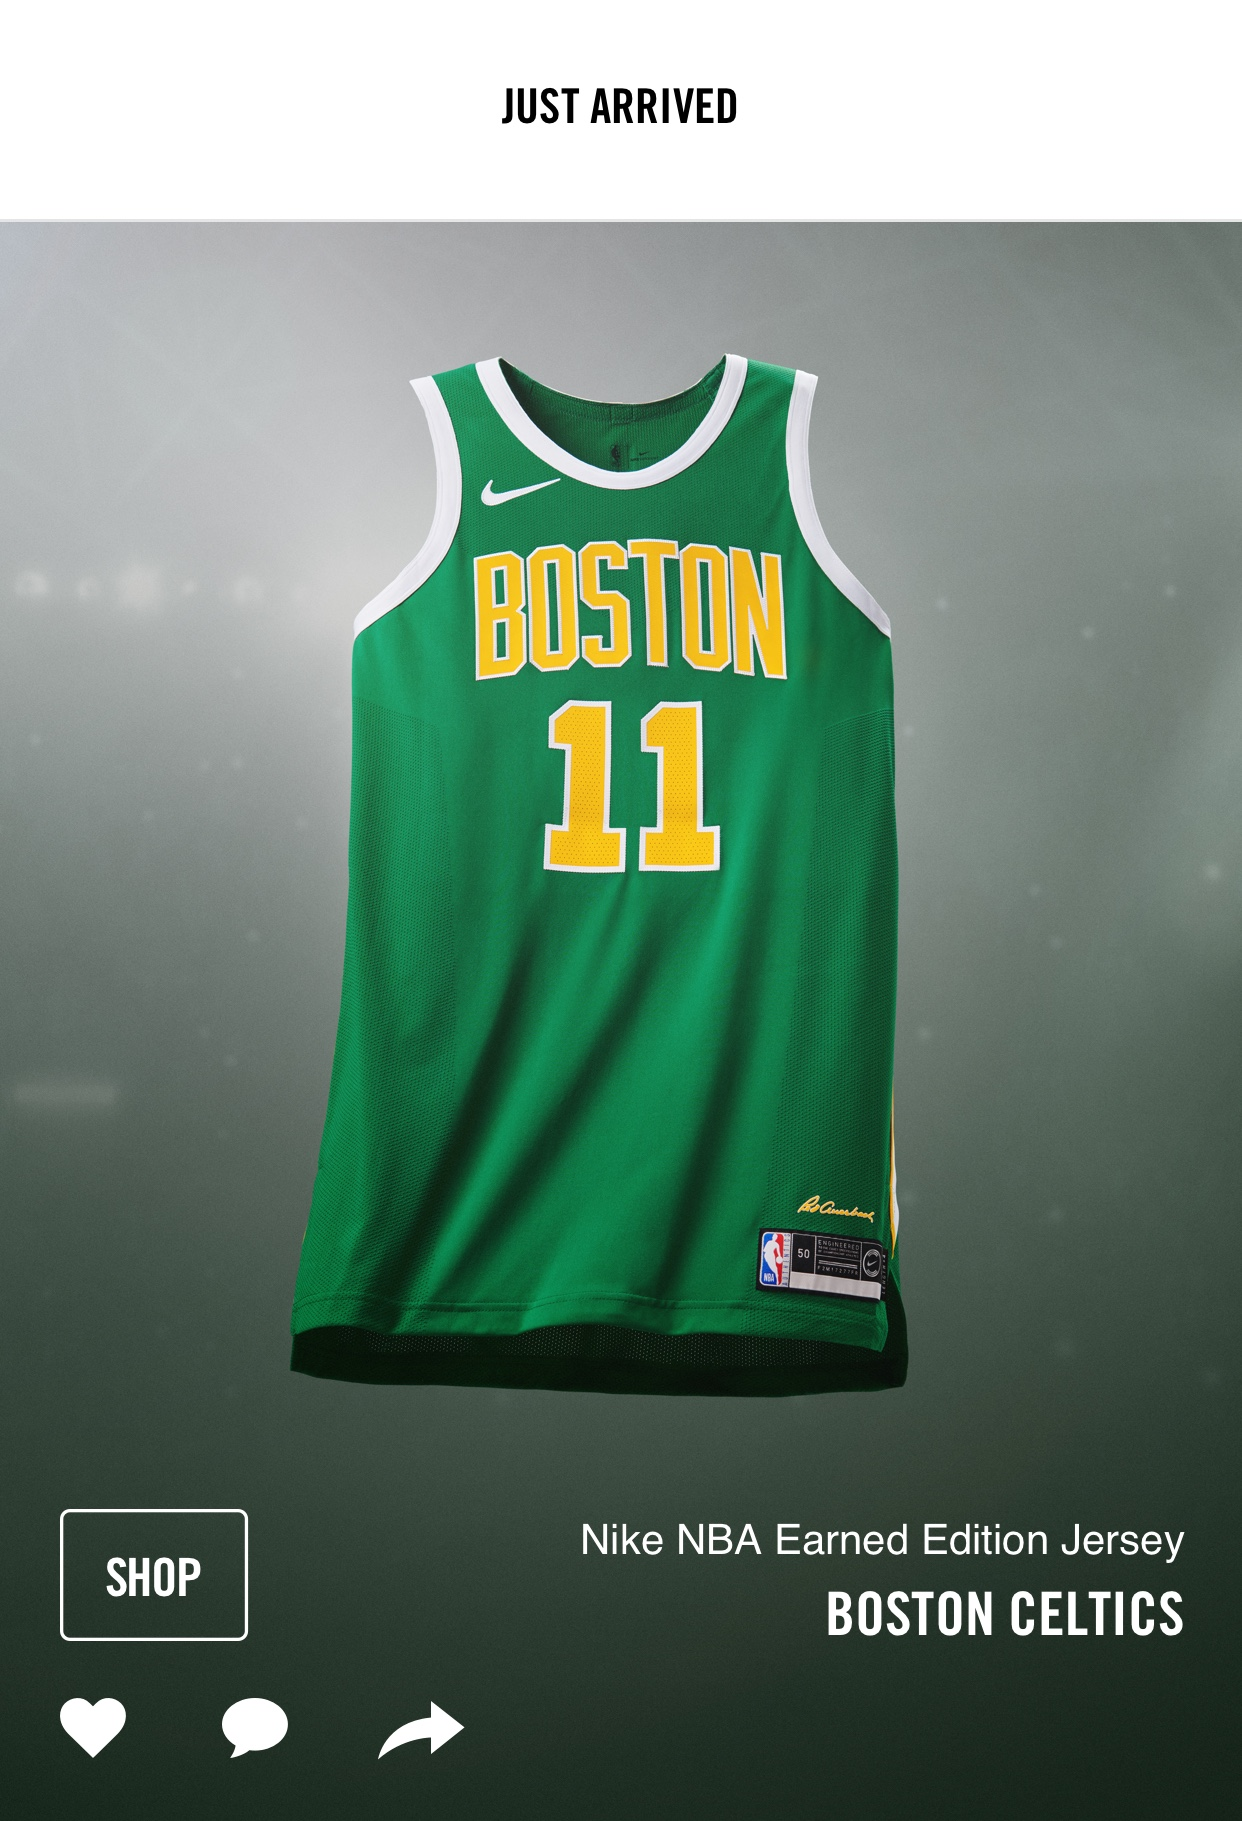 Nike_NBA_EE_Boston_Celtics_APP_FeedCard_NoCTA.jpg